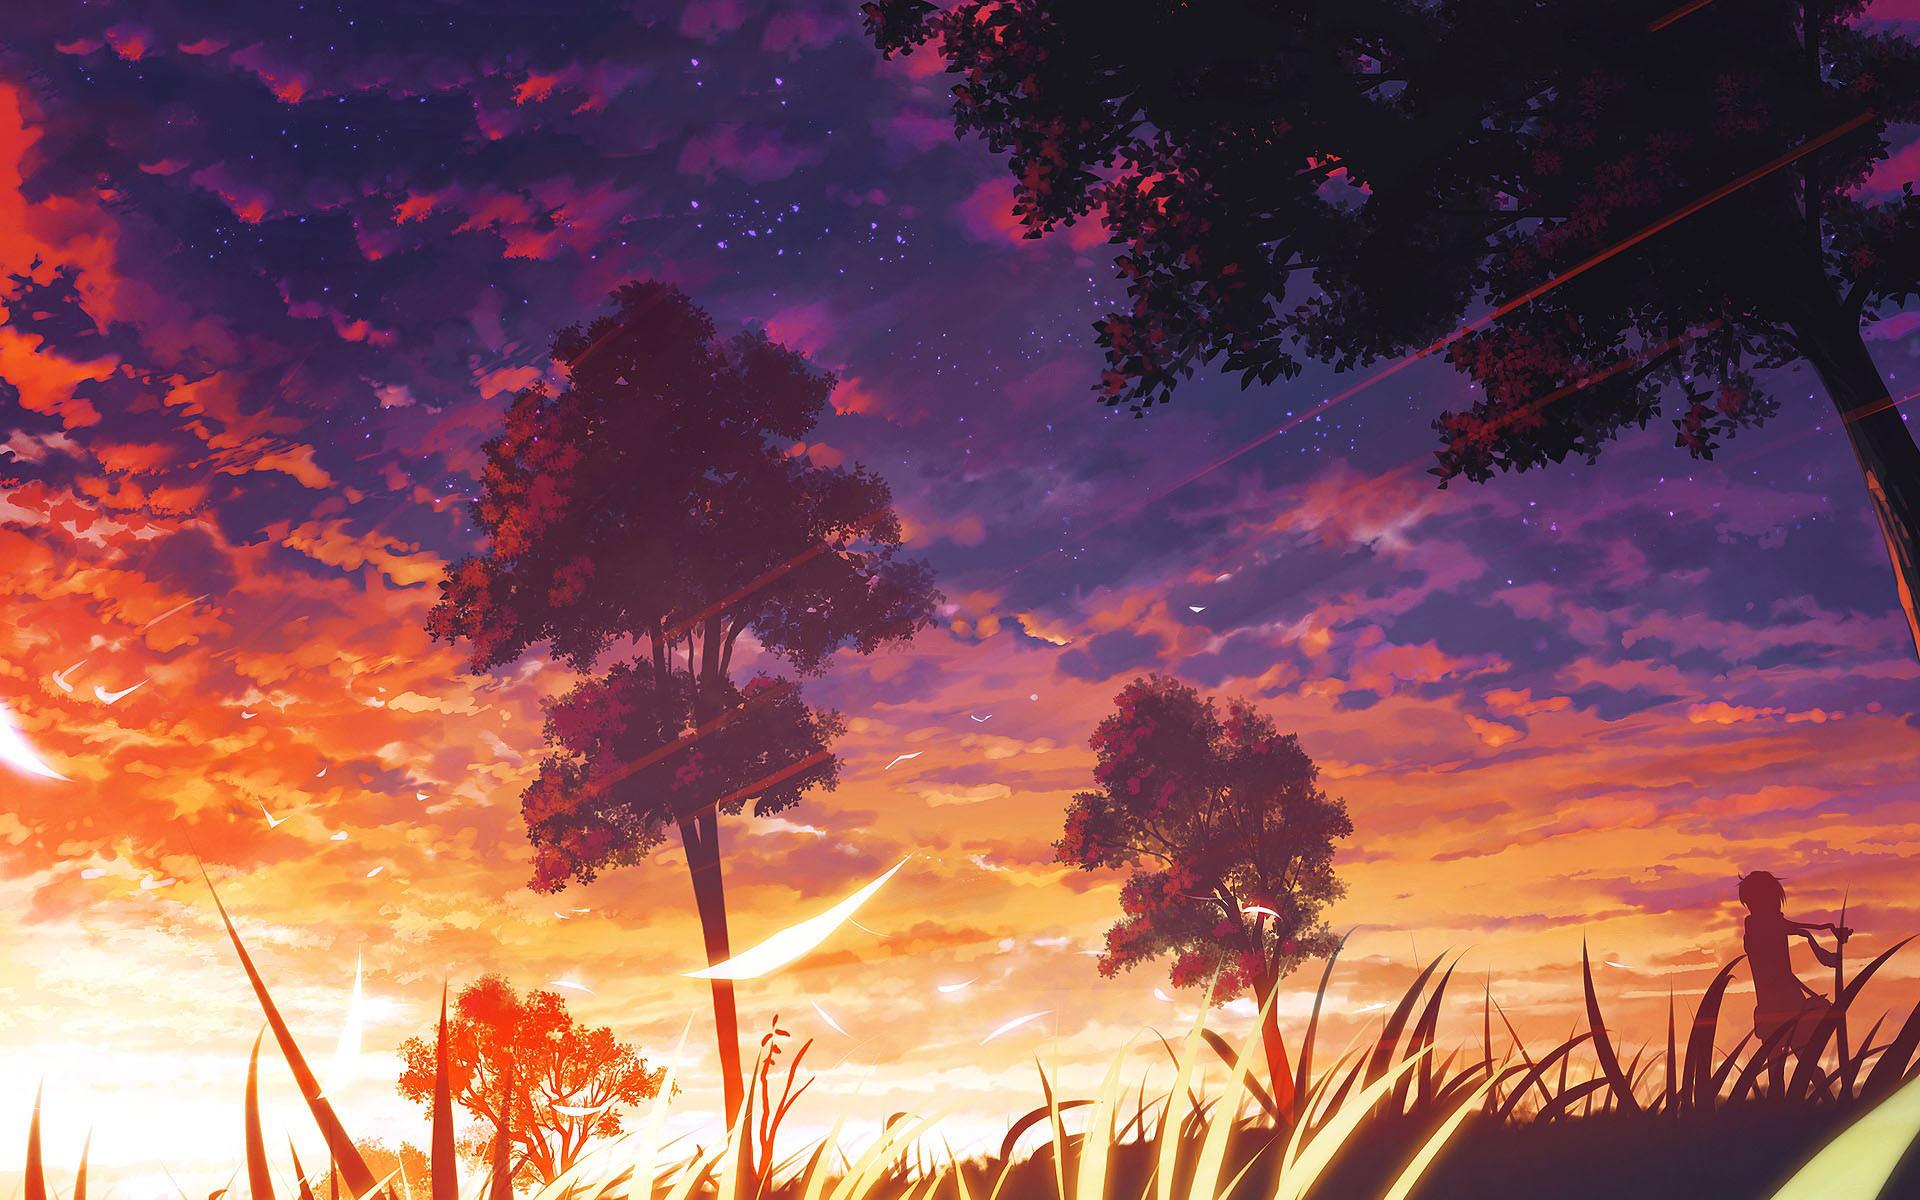 Sunset Anime Girl